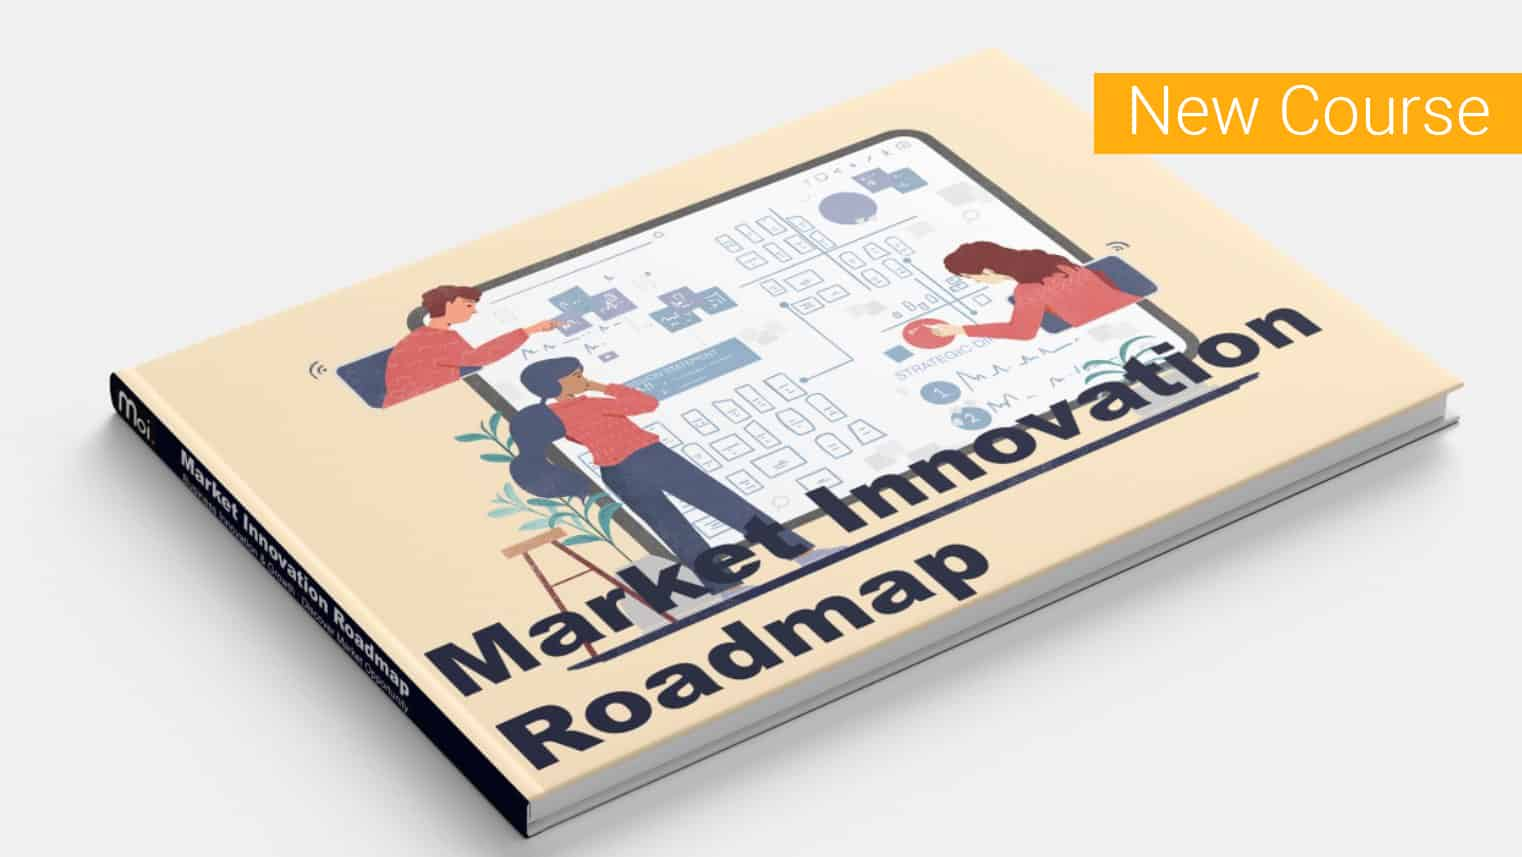 Innovation education platform, focused industry innovation training, professional coaching | Moi Studio